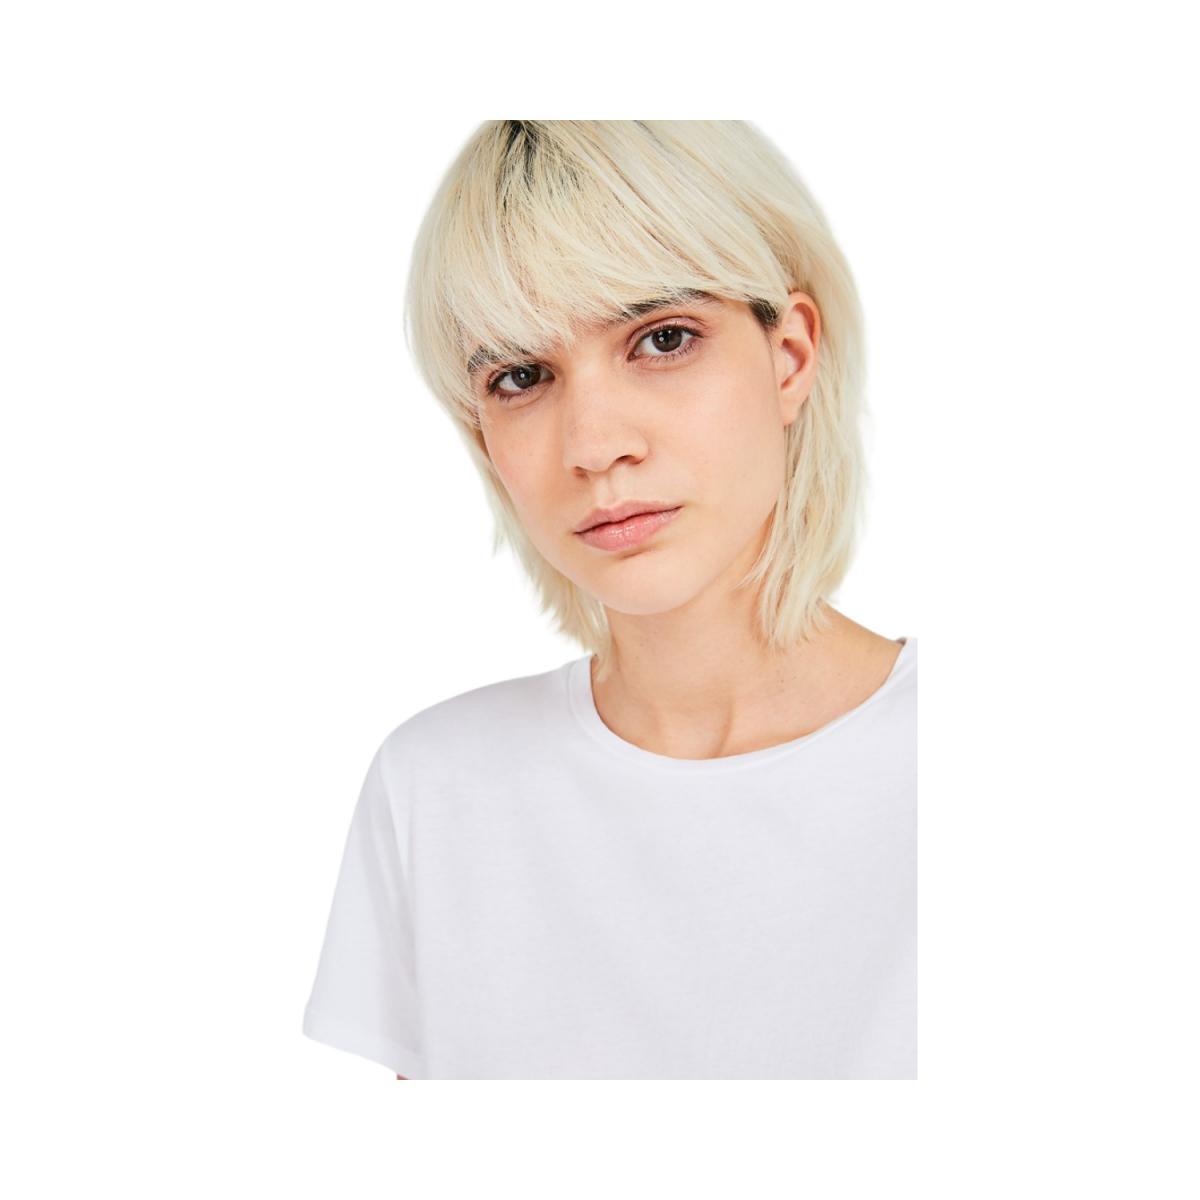 vegiflower t-shirt - blance - detalje billede